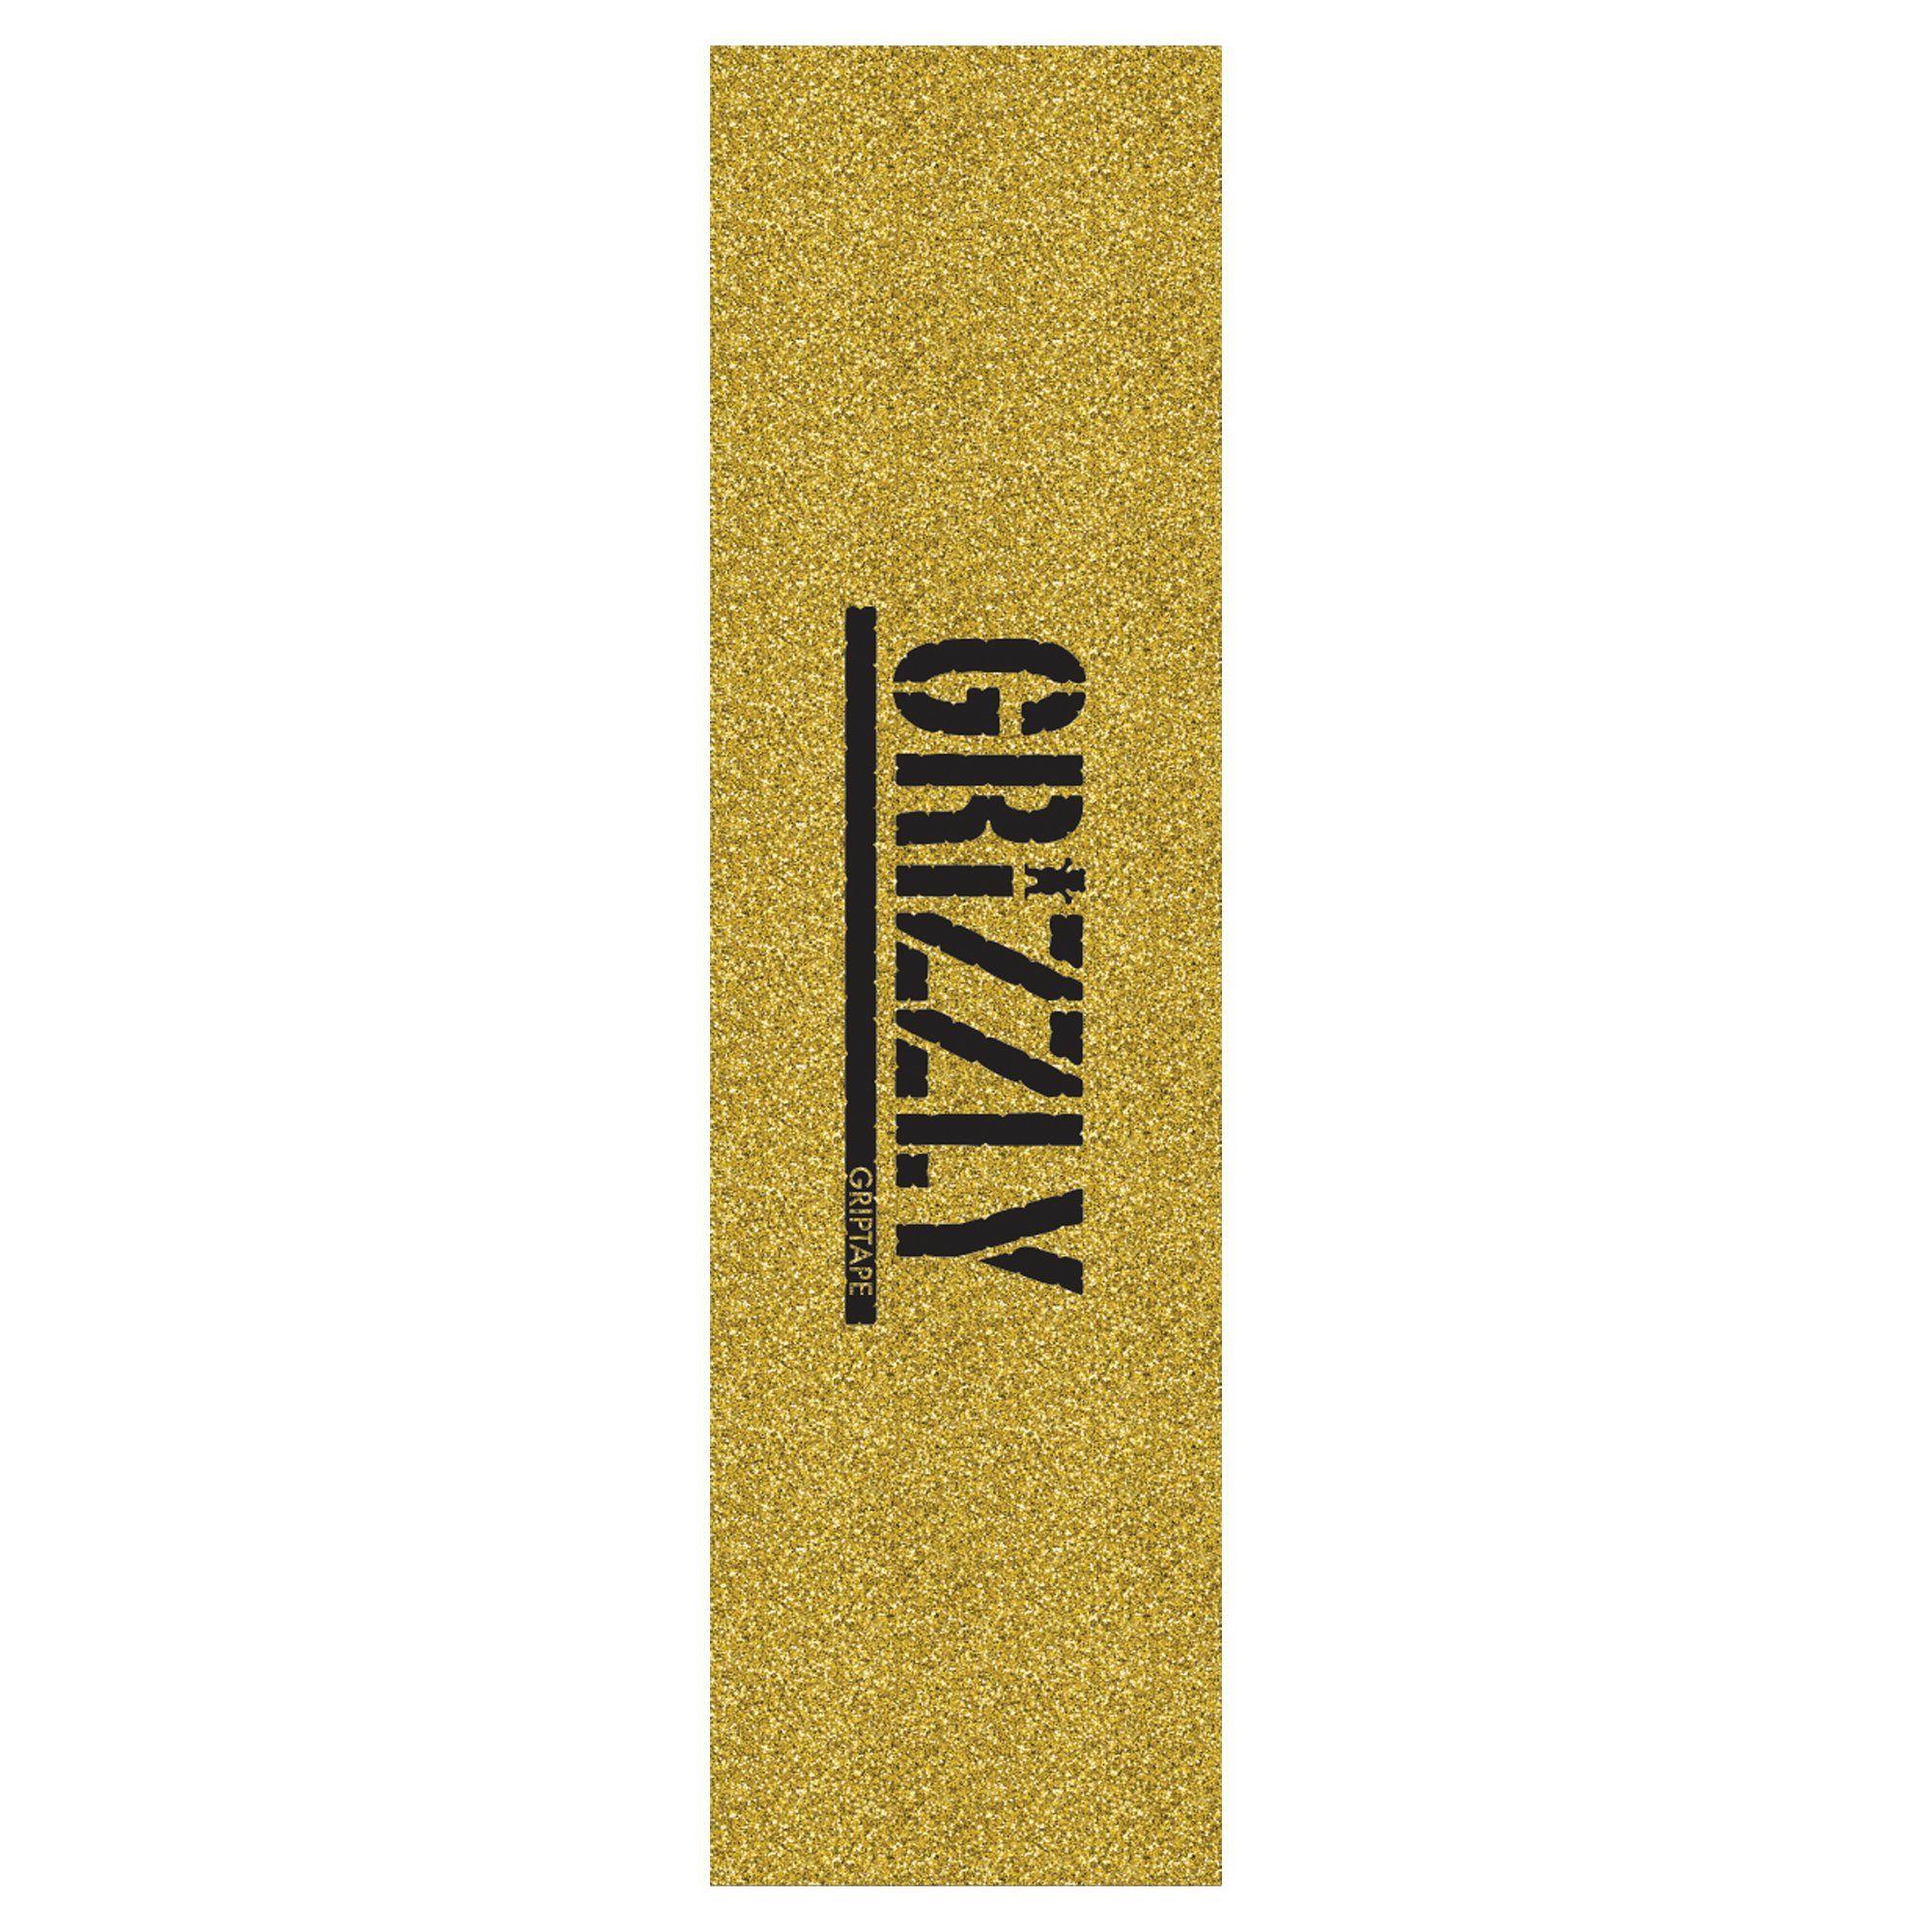 Hunpta épais Longboard Skateboard Griptape pont papier abrasif Bande antidérapante 83x 23cm Autocollant